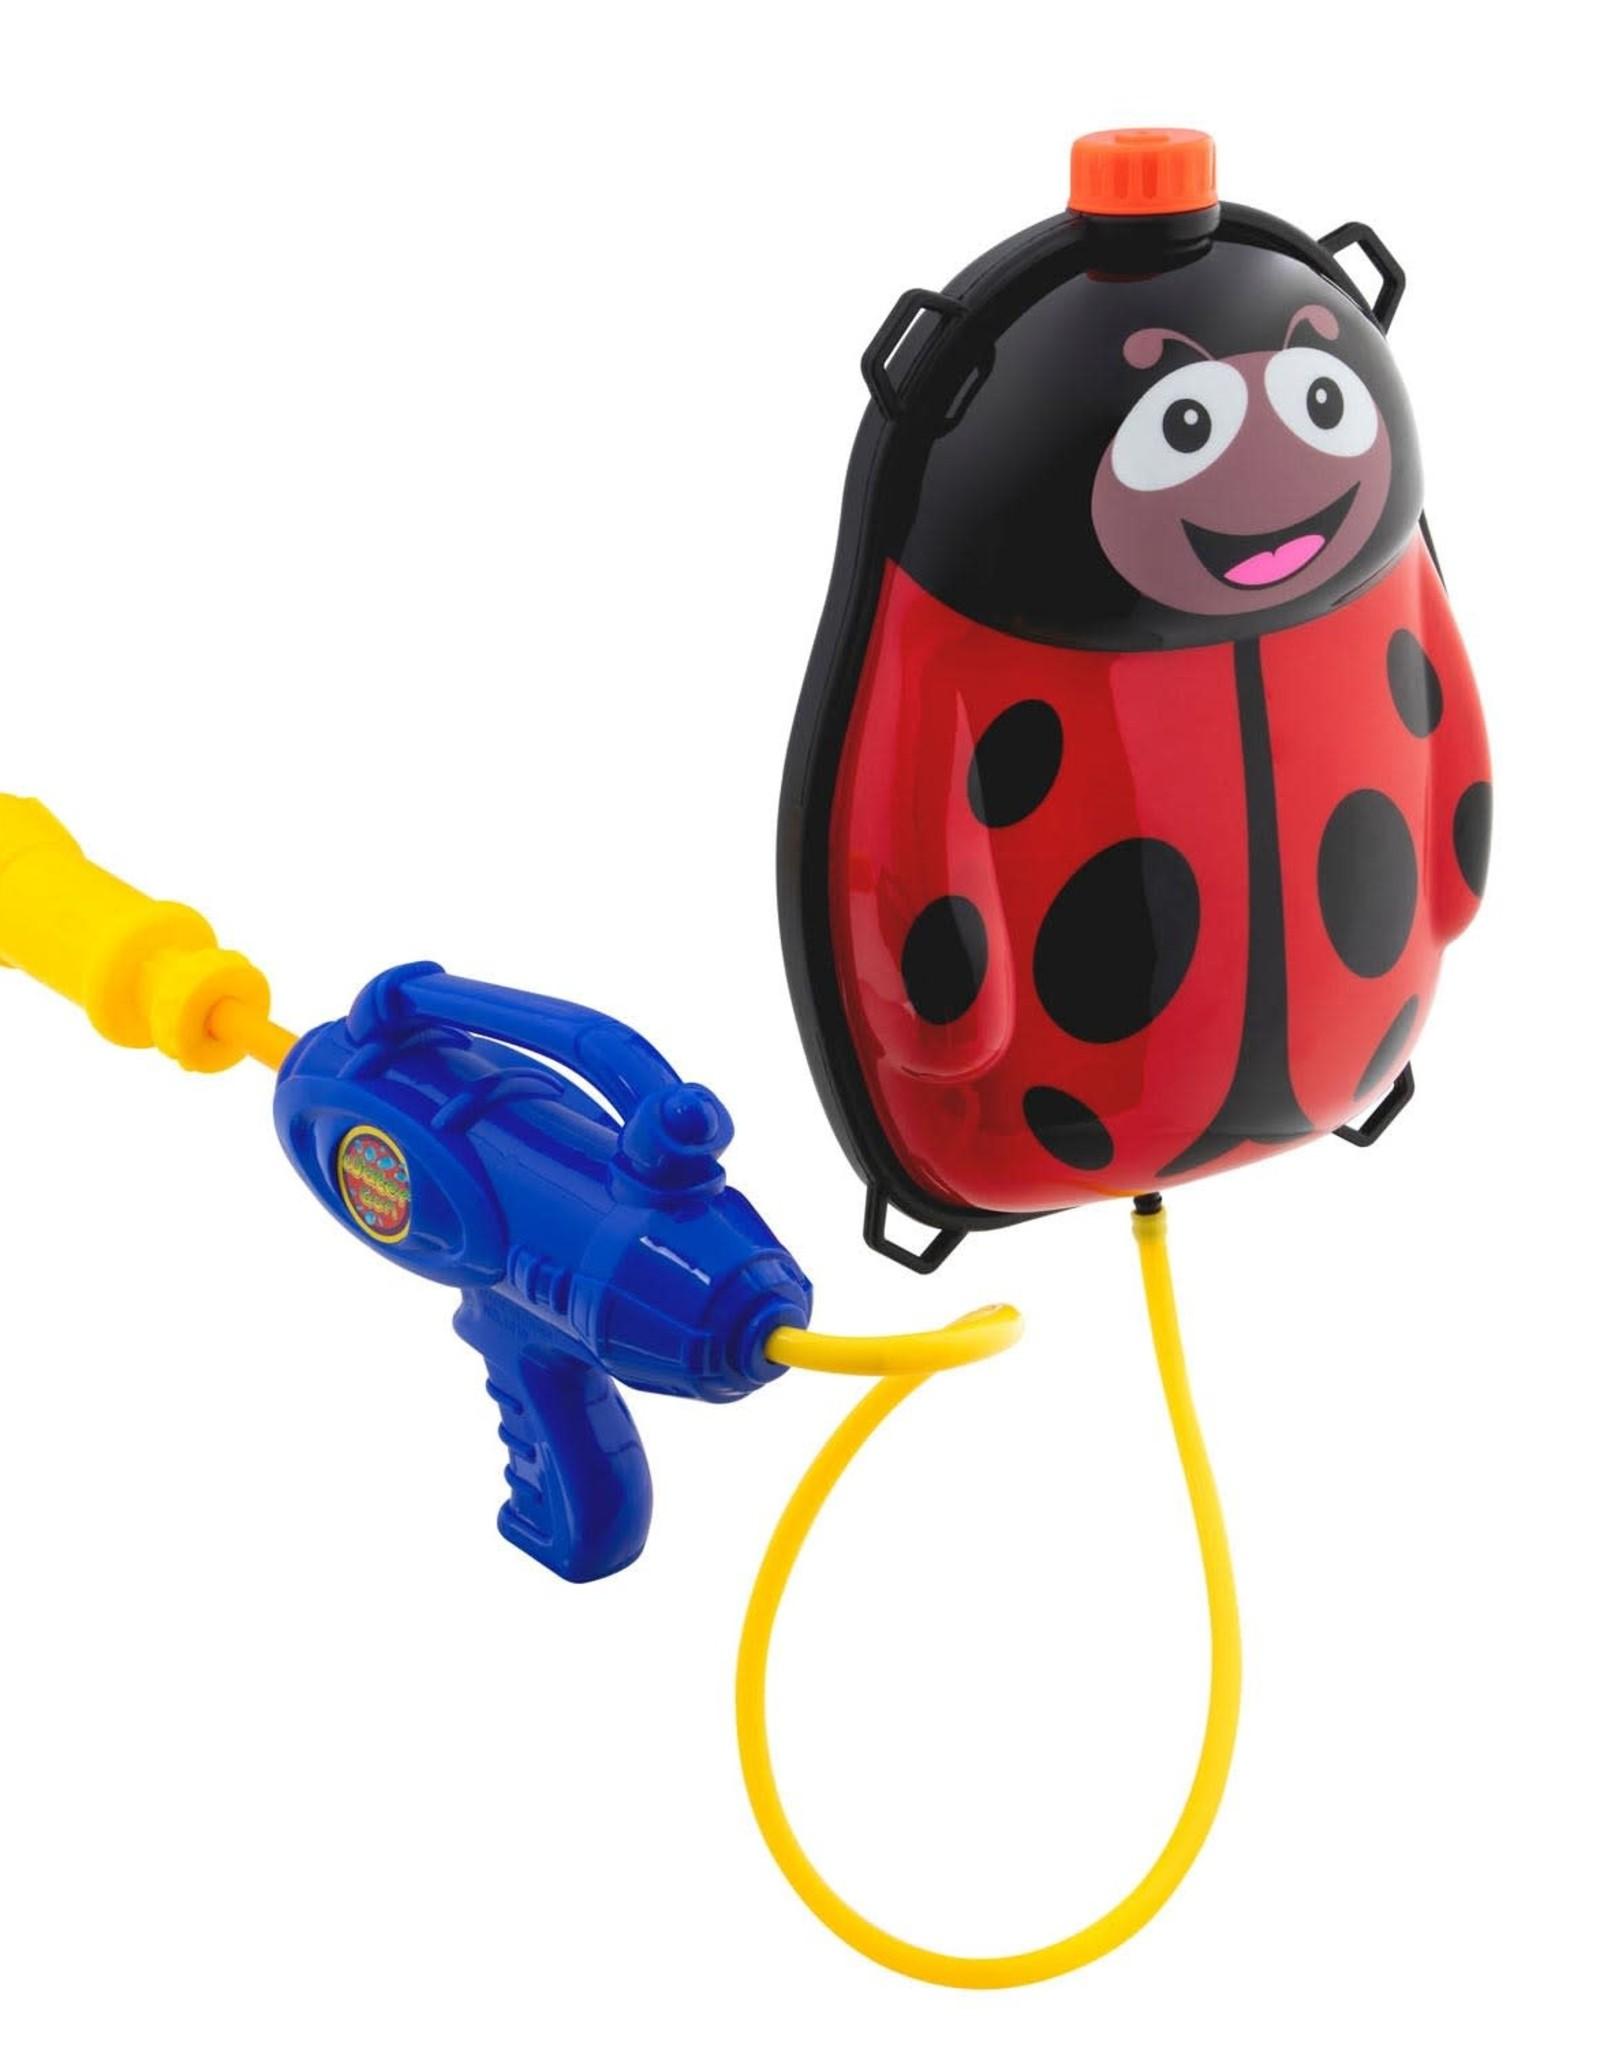 Waterpistool met watertank Lieveheersbeestje